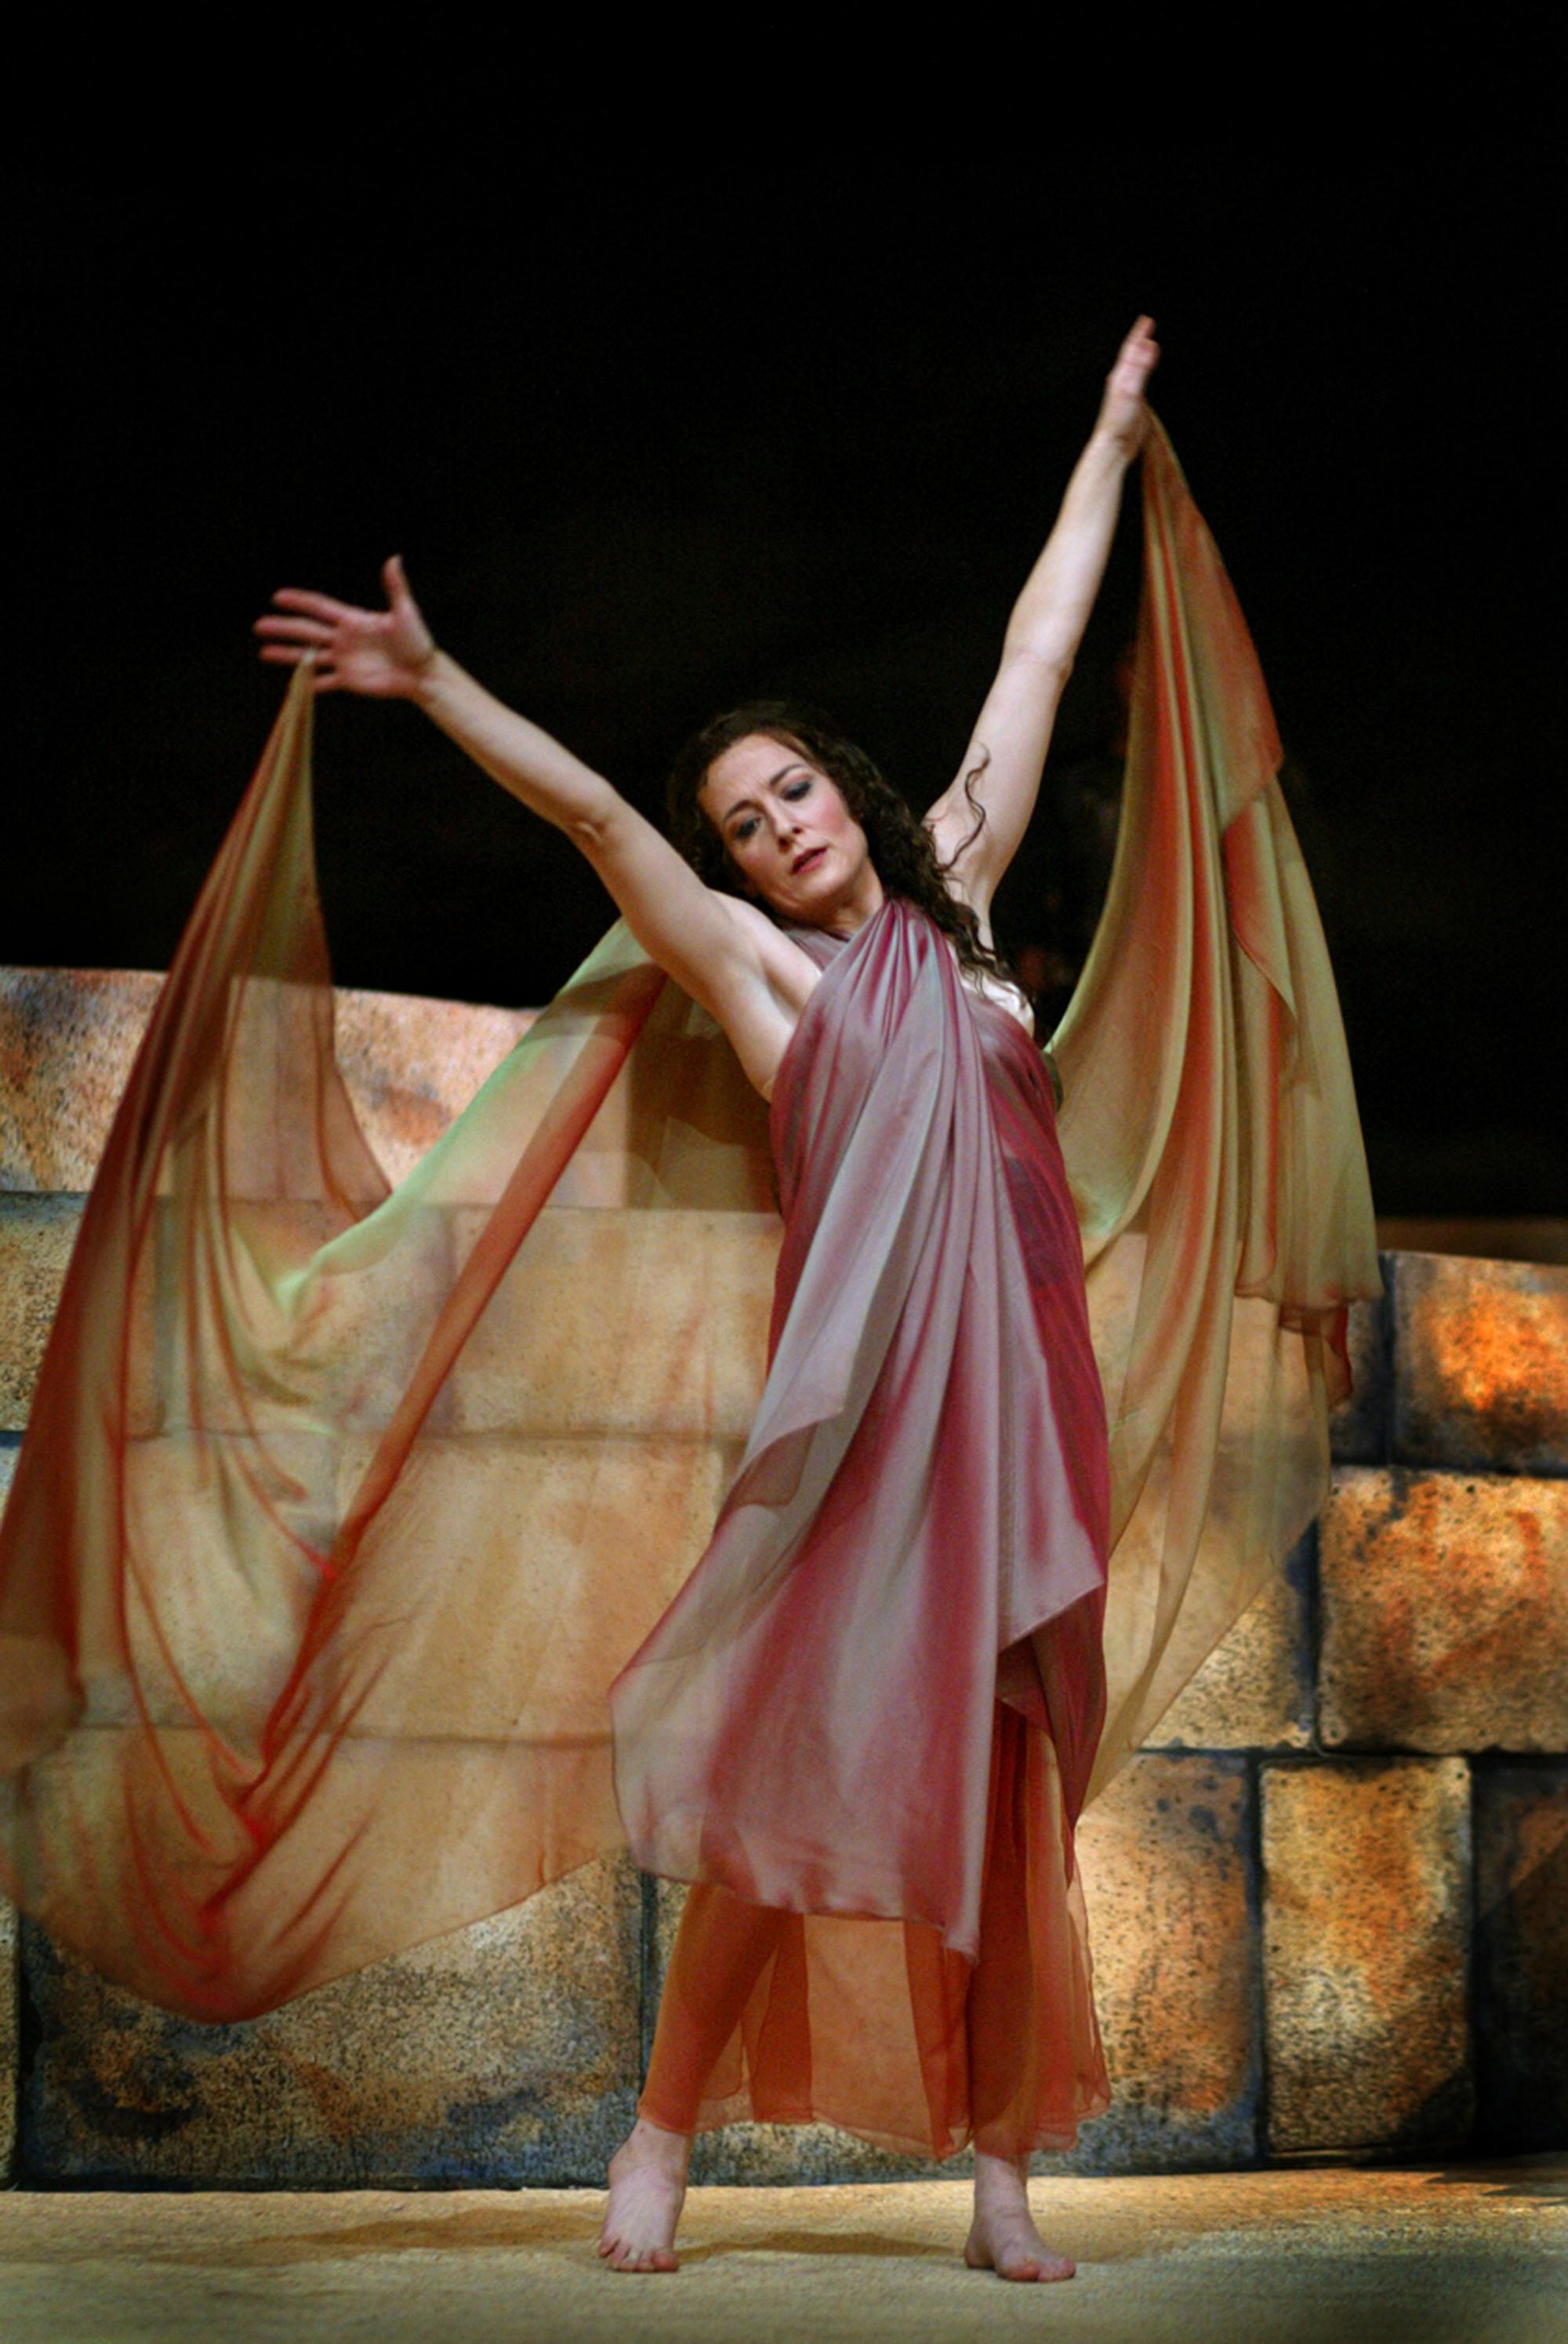 Toledo Operas New Production Has Local Flavor Via Set